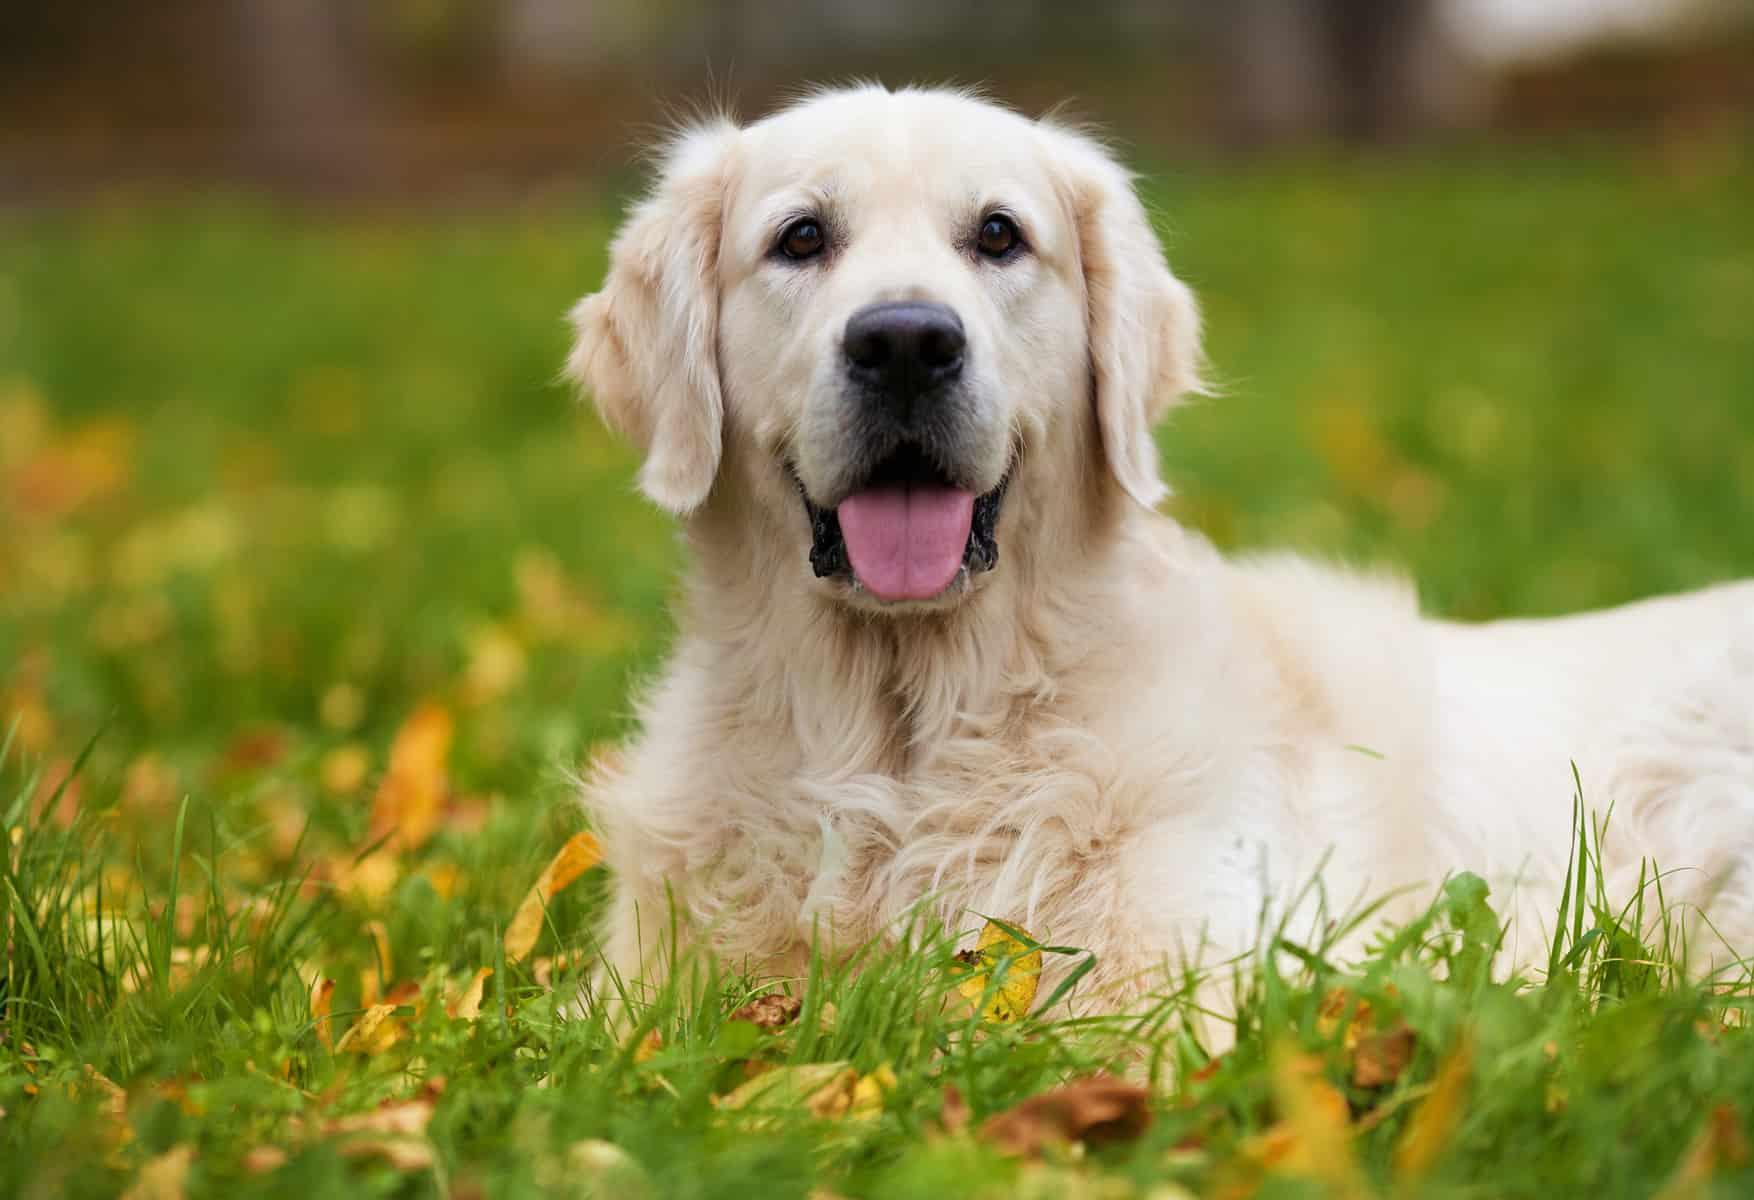 a happy Golden Retriever peeking through tall grasses